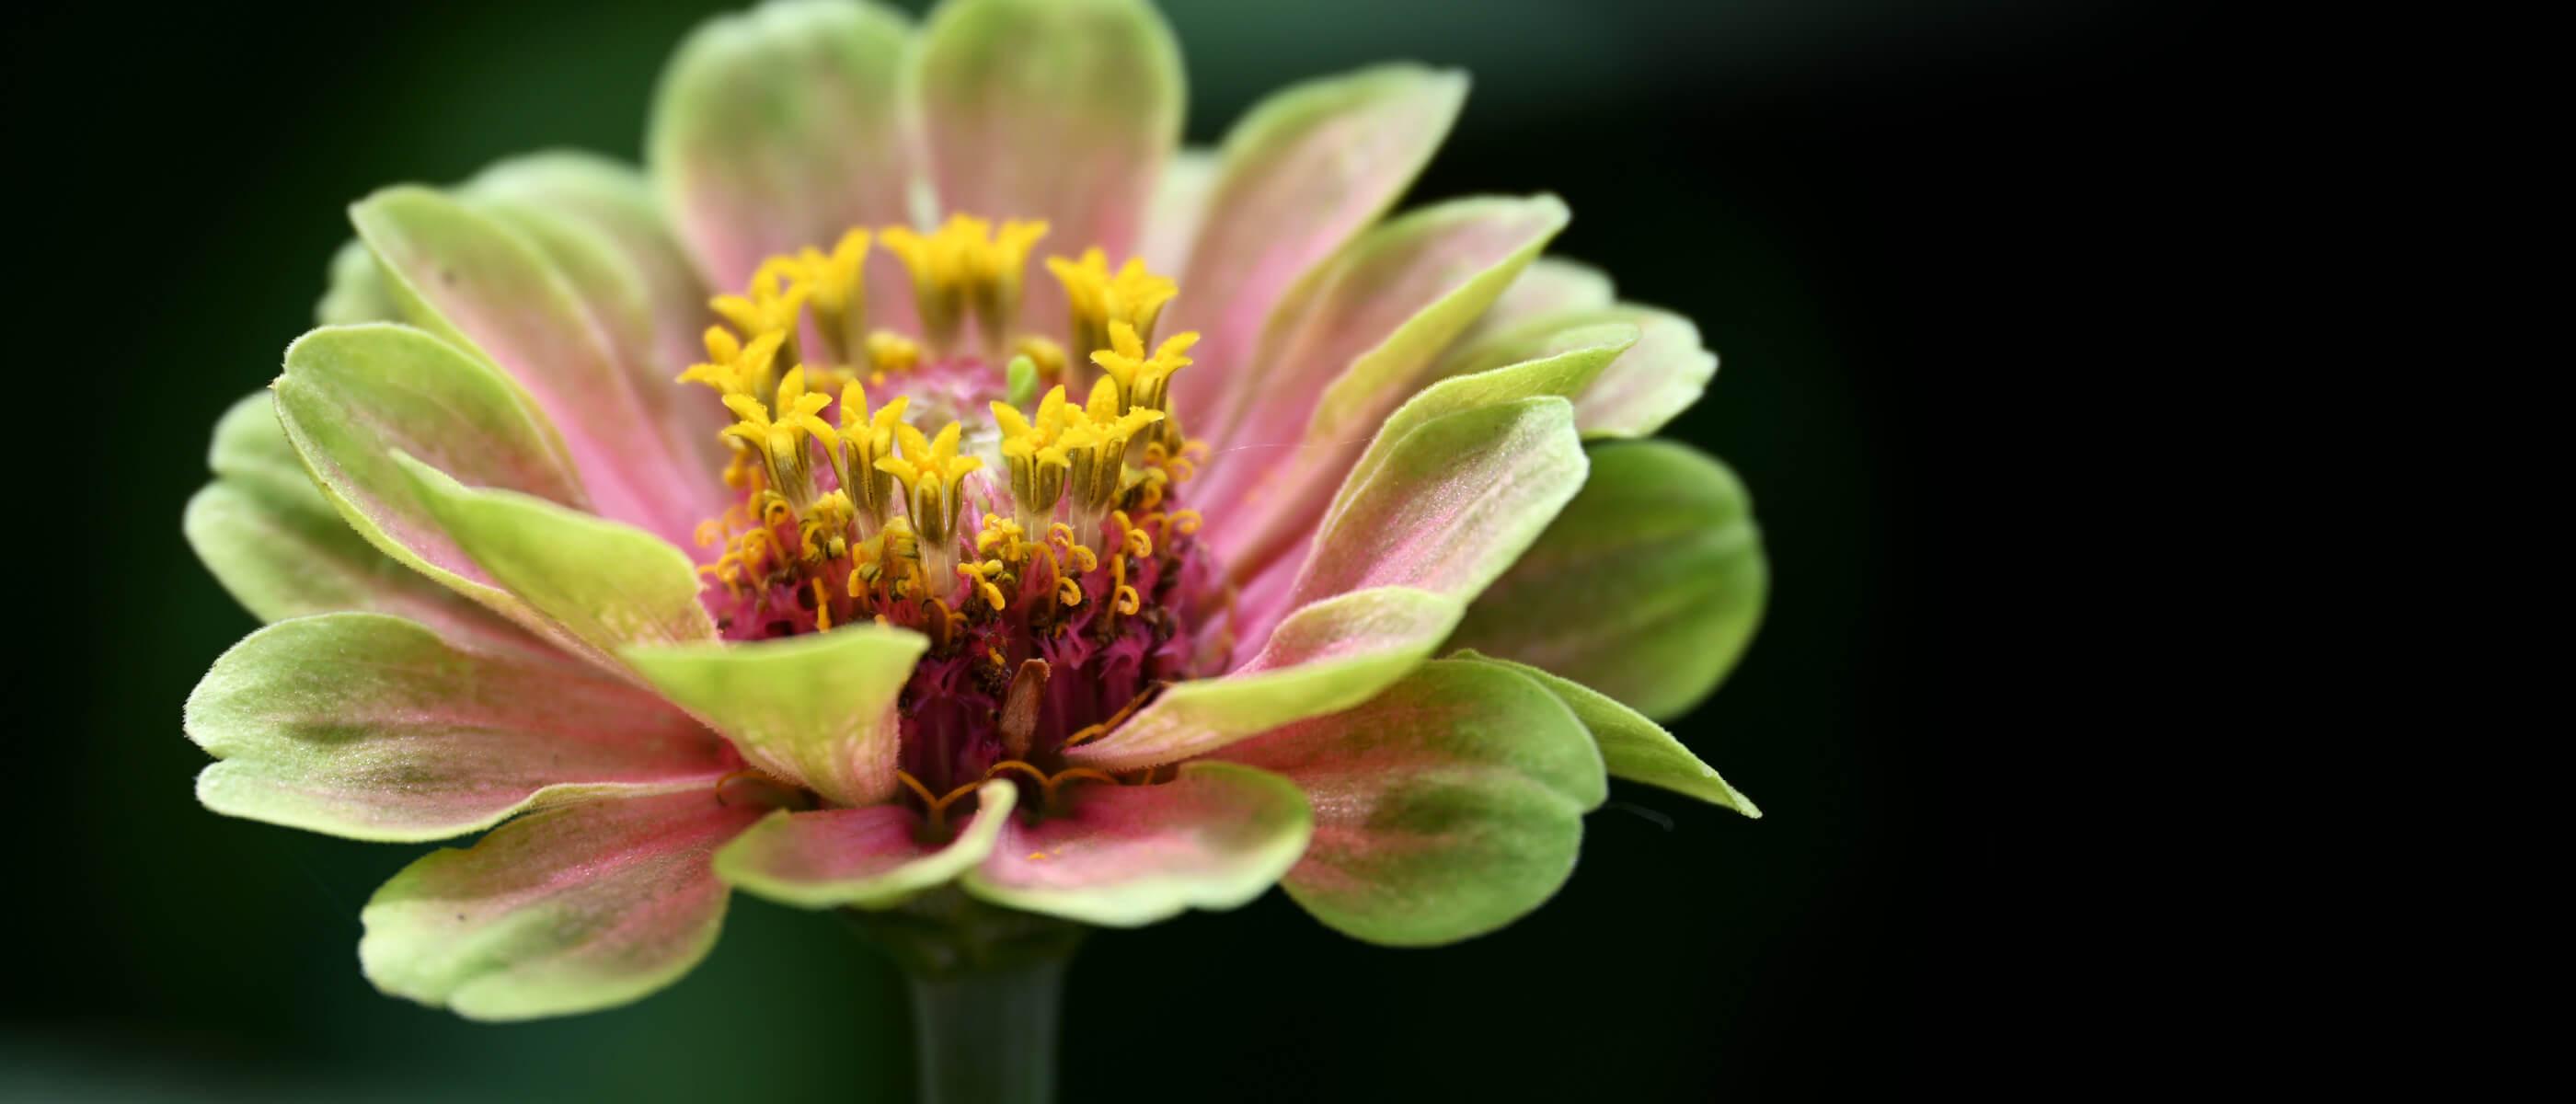 photo of a flower, taken with the NIKKOR Z DX 18-140mm f/3.5-6.3 VR lens